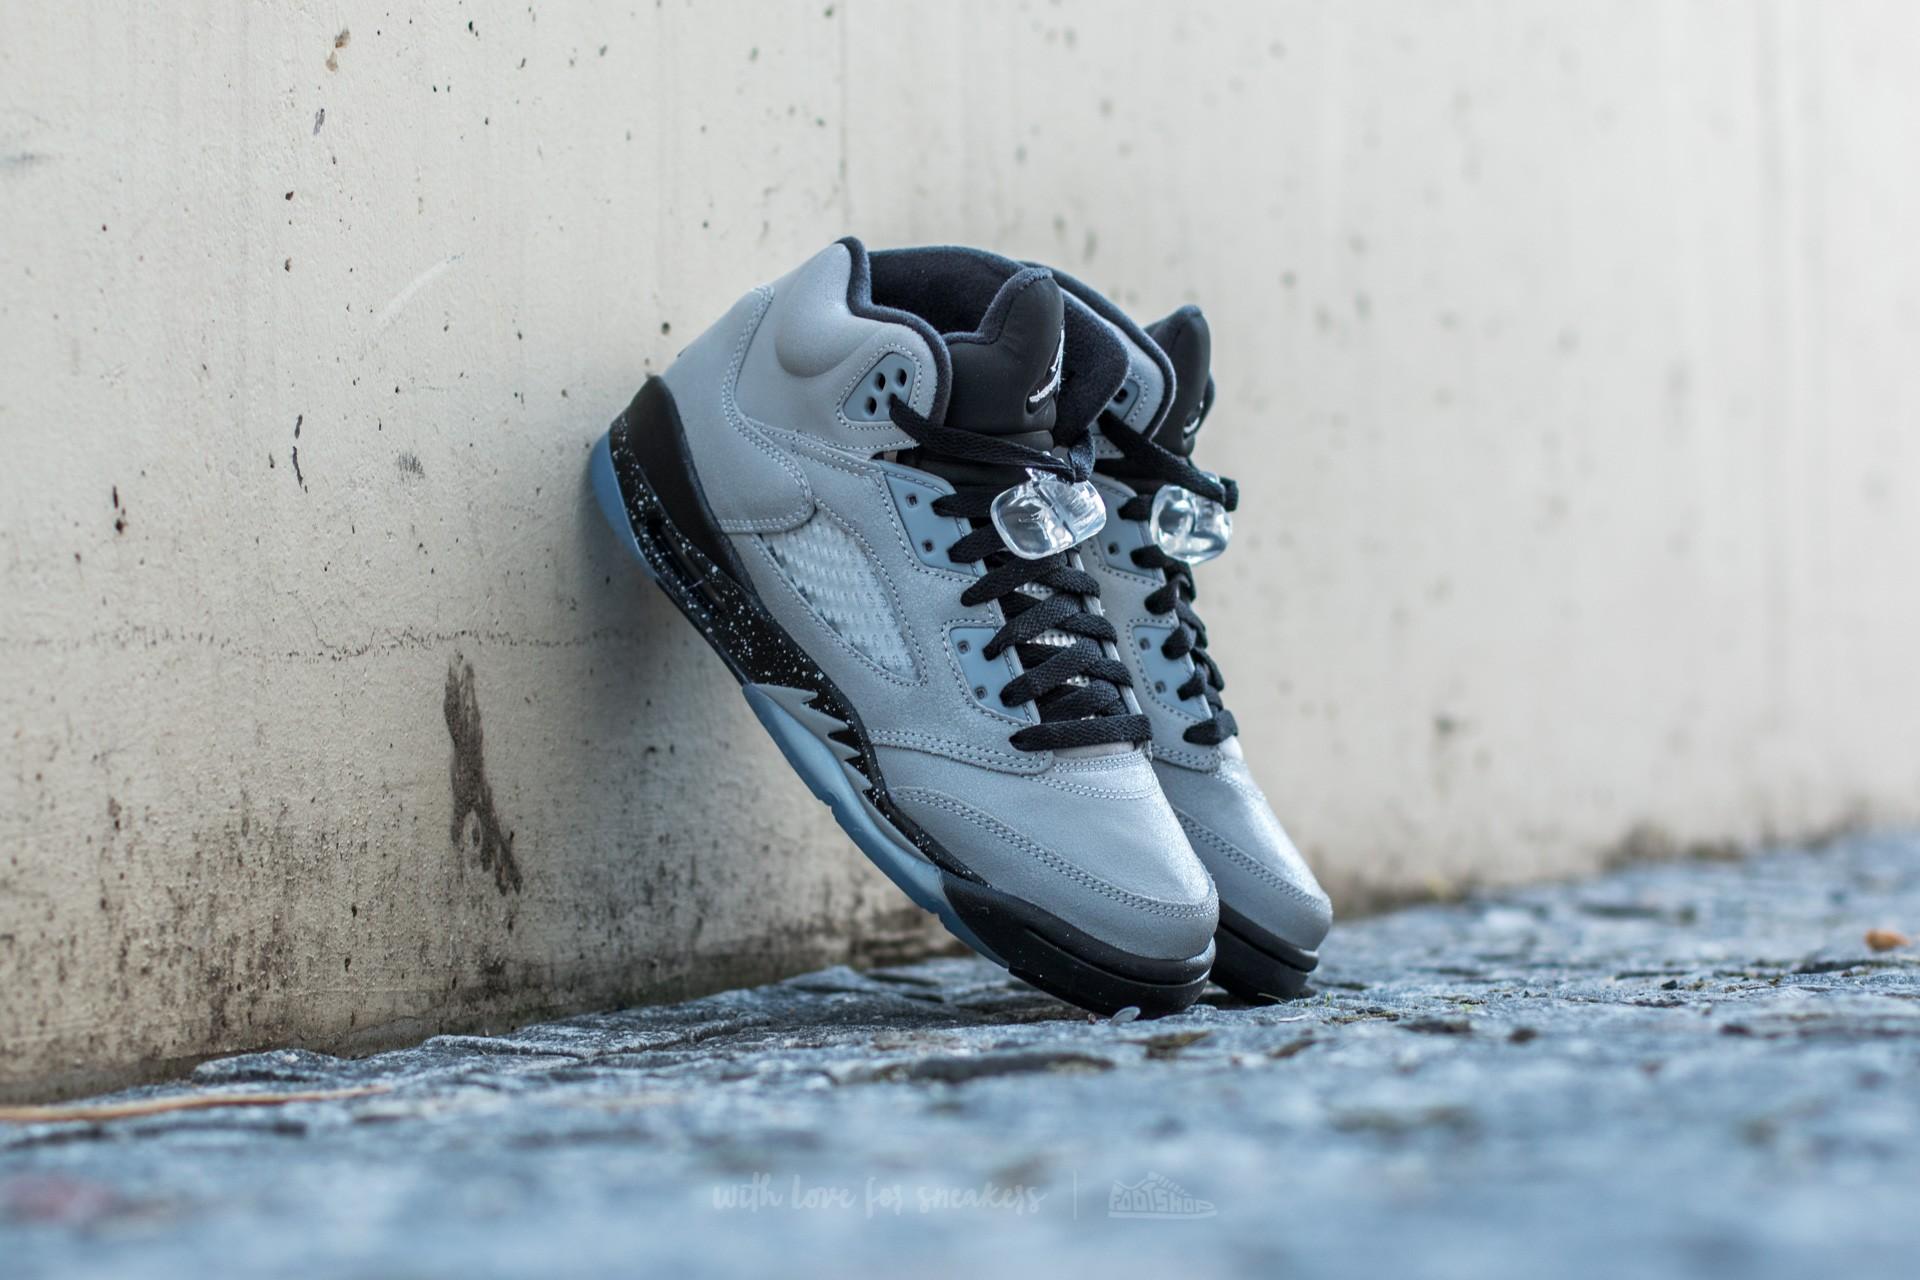 13be45fa1bd69 Air Jordan 5 Retro (GG) Wolf Grey  Black-Black